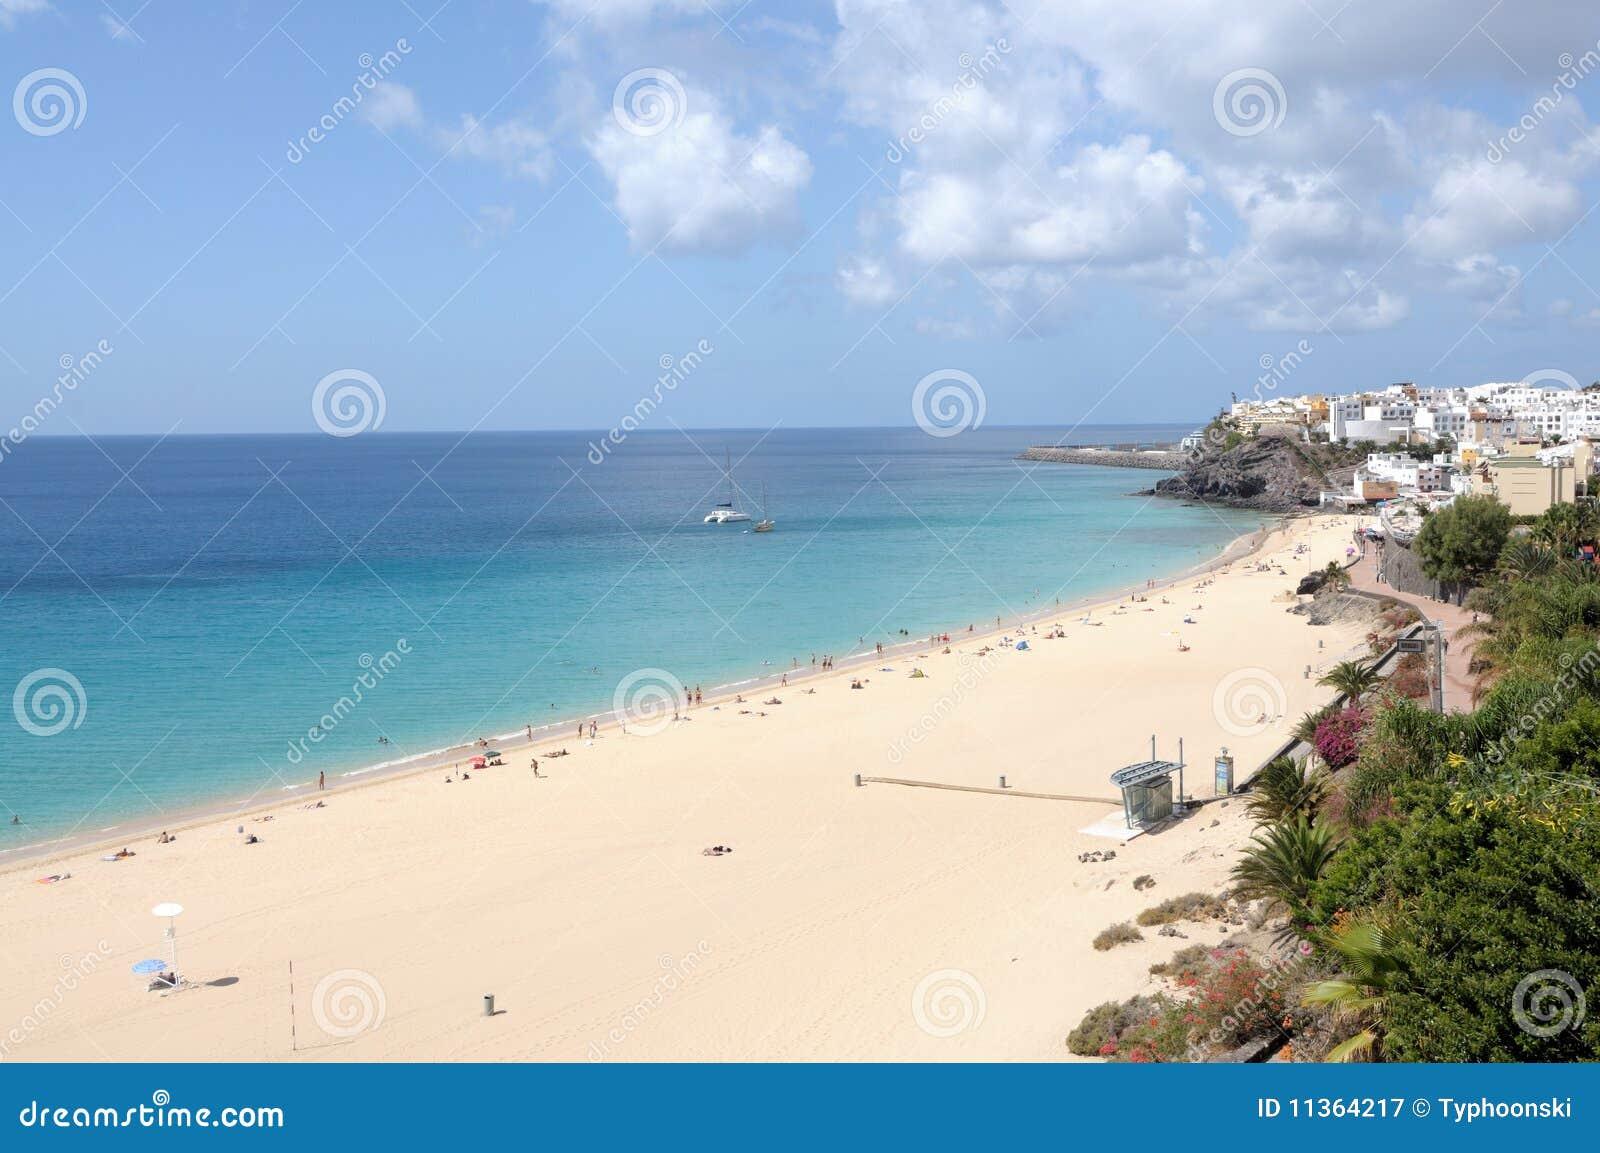 Matrimonio Spiaggia Fuerteventura : Spiaggia di morro jable fuerteventura spagna immagine